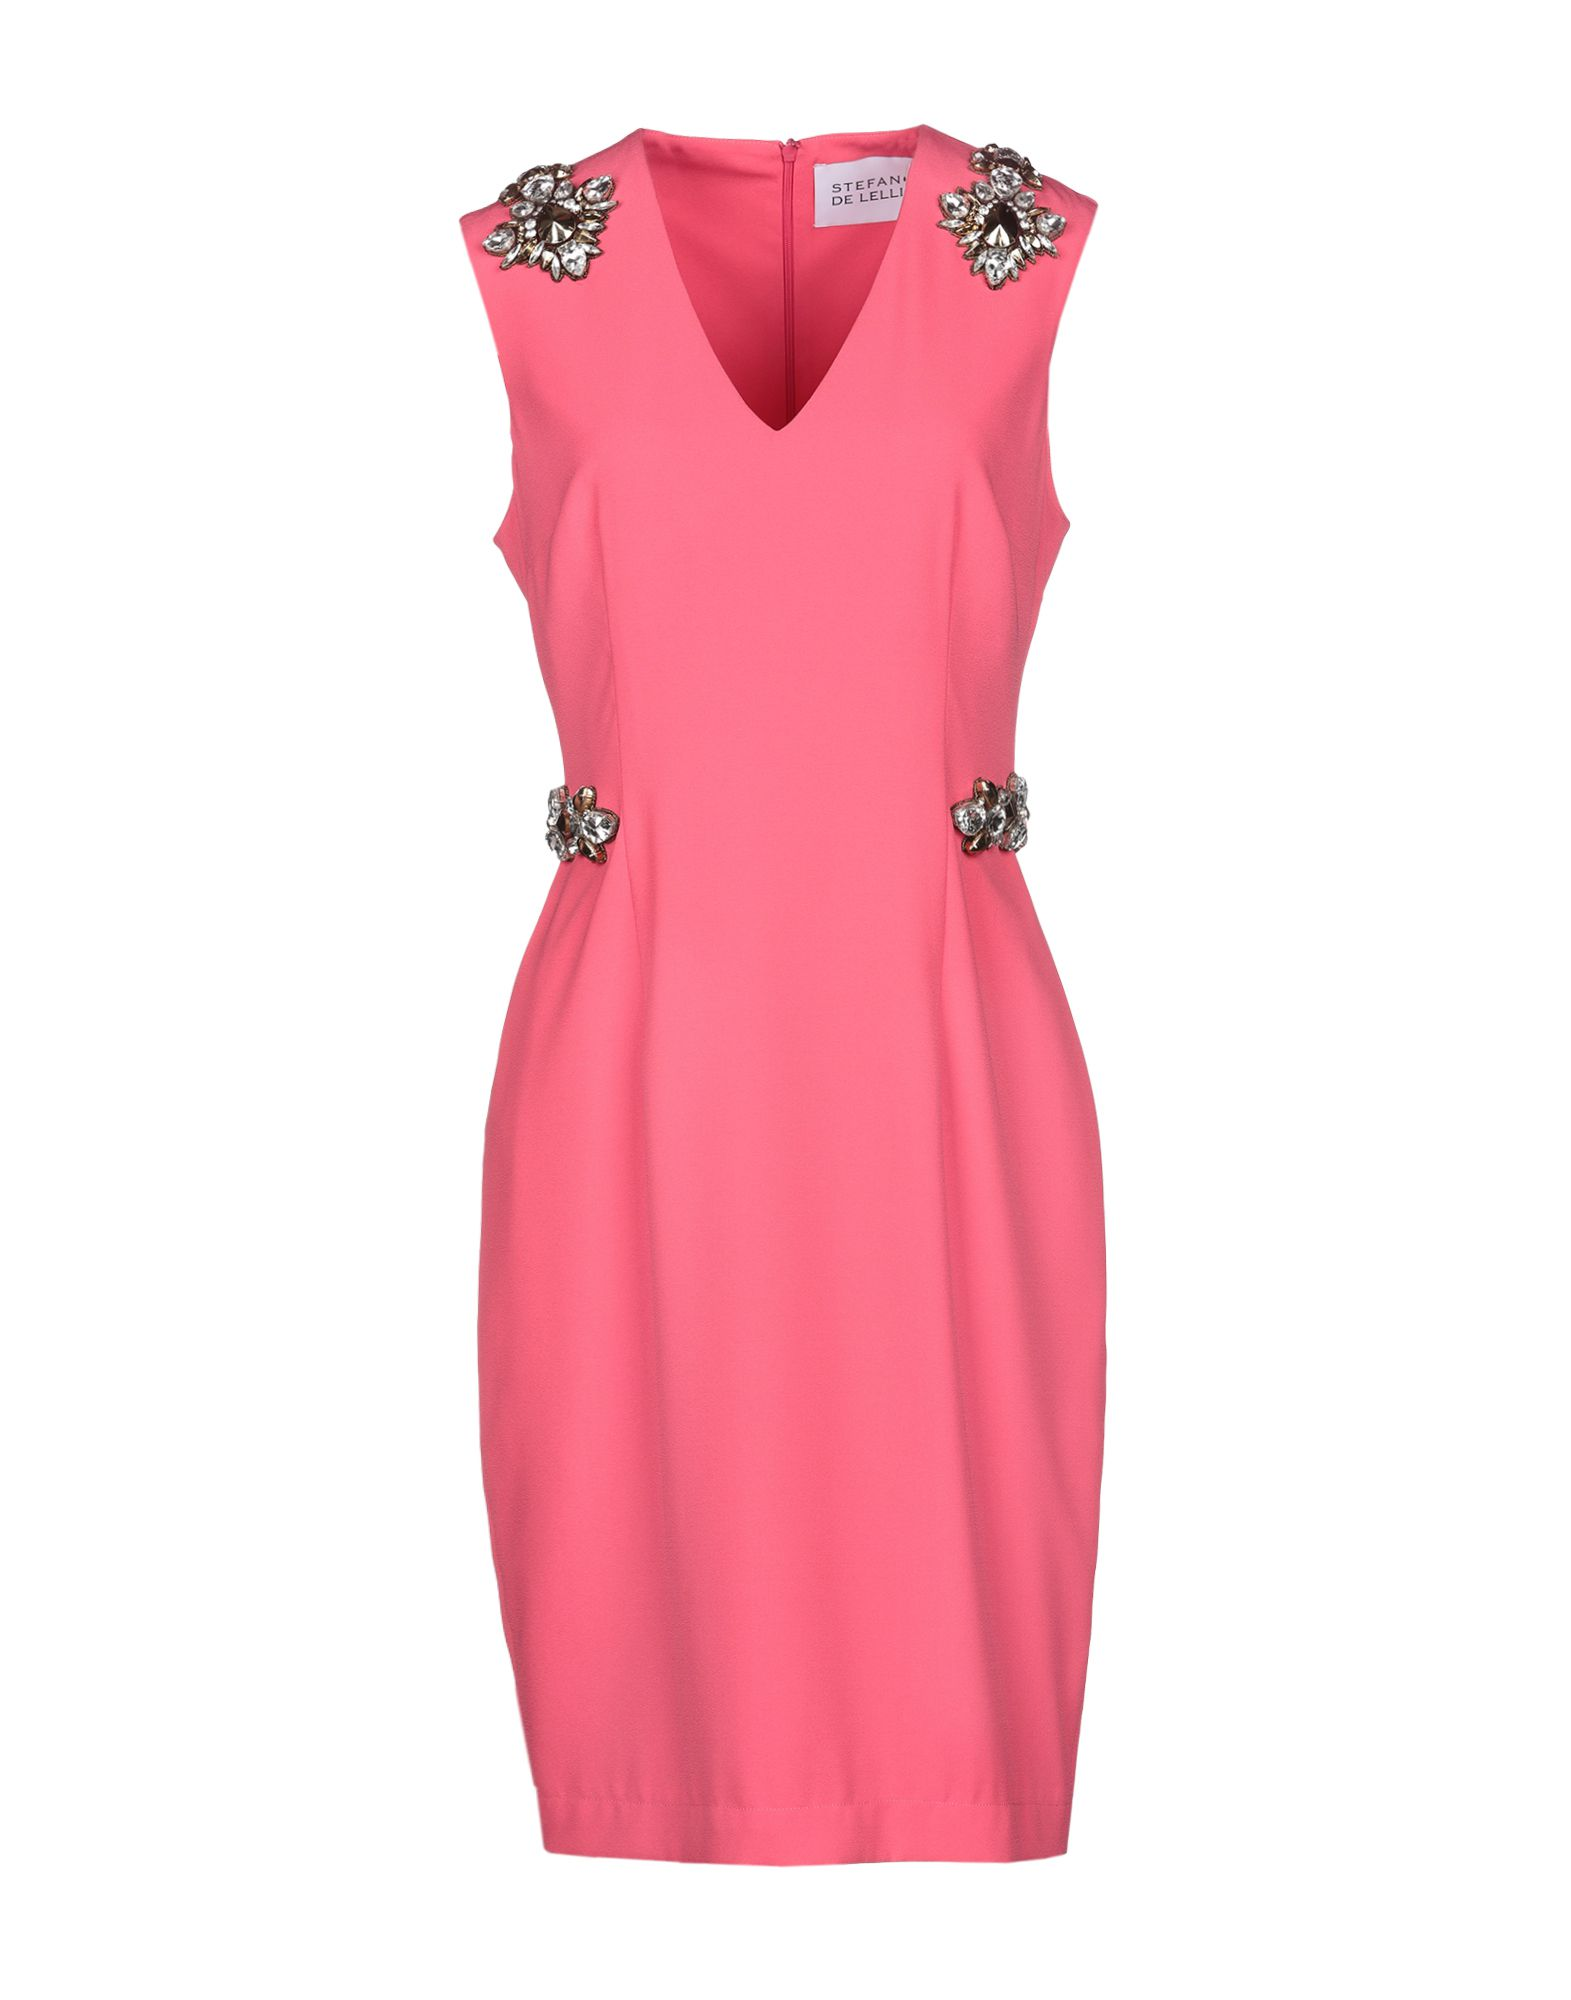 STEFANO DE LELLIS Knee-Length Dresses in Pink